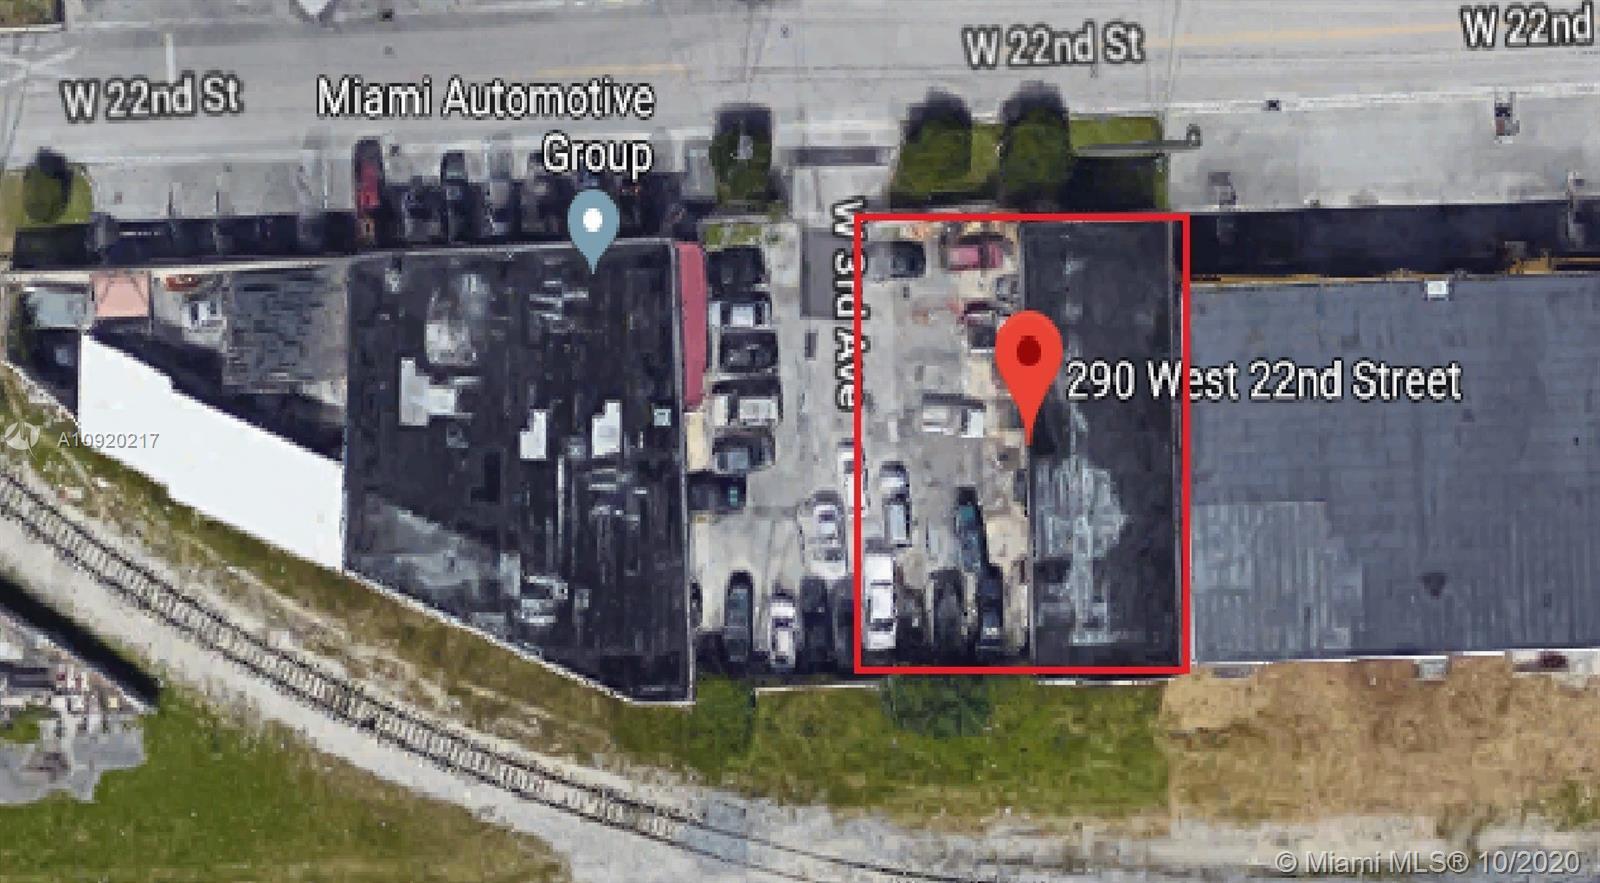 2150 W 3rd Ave, Hialeah, FL, 33010